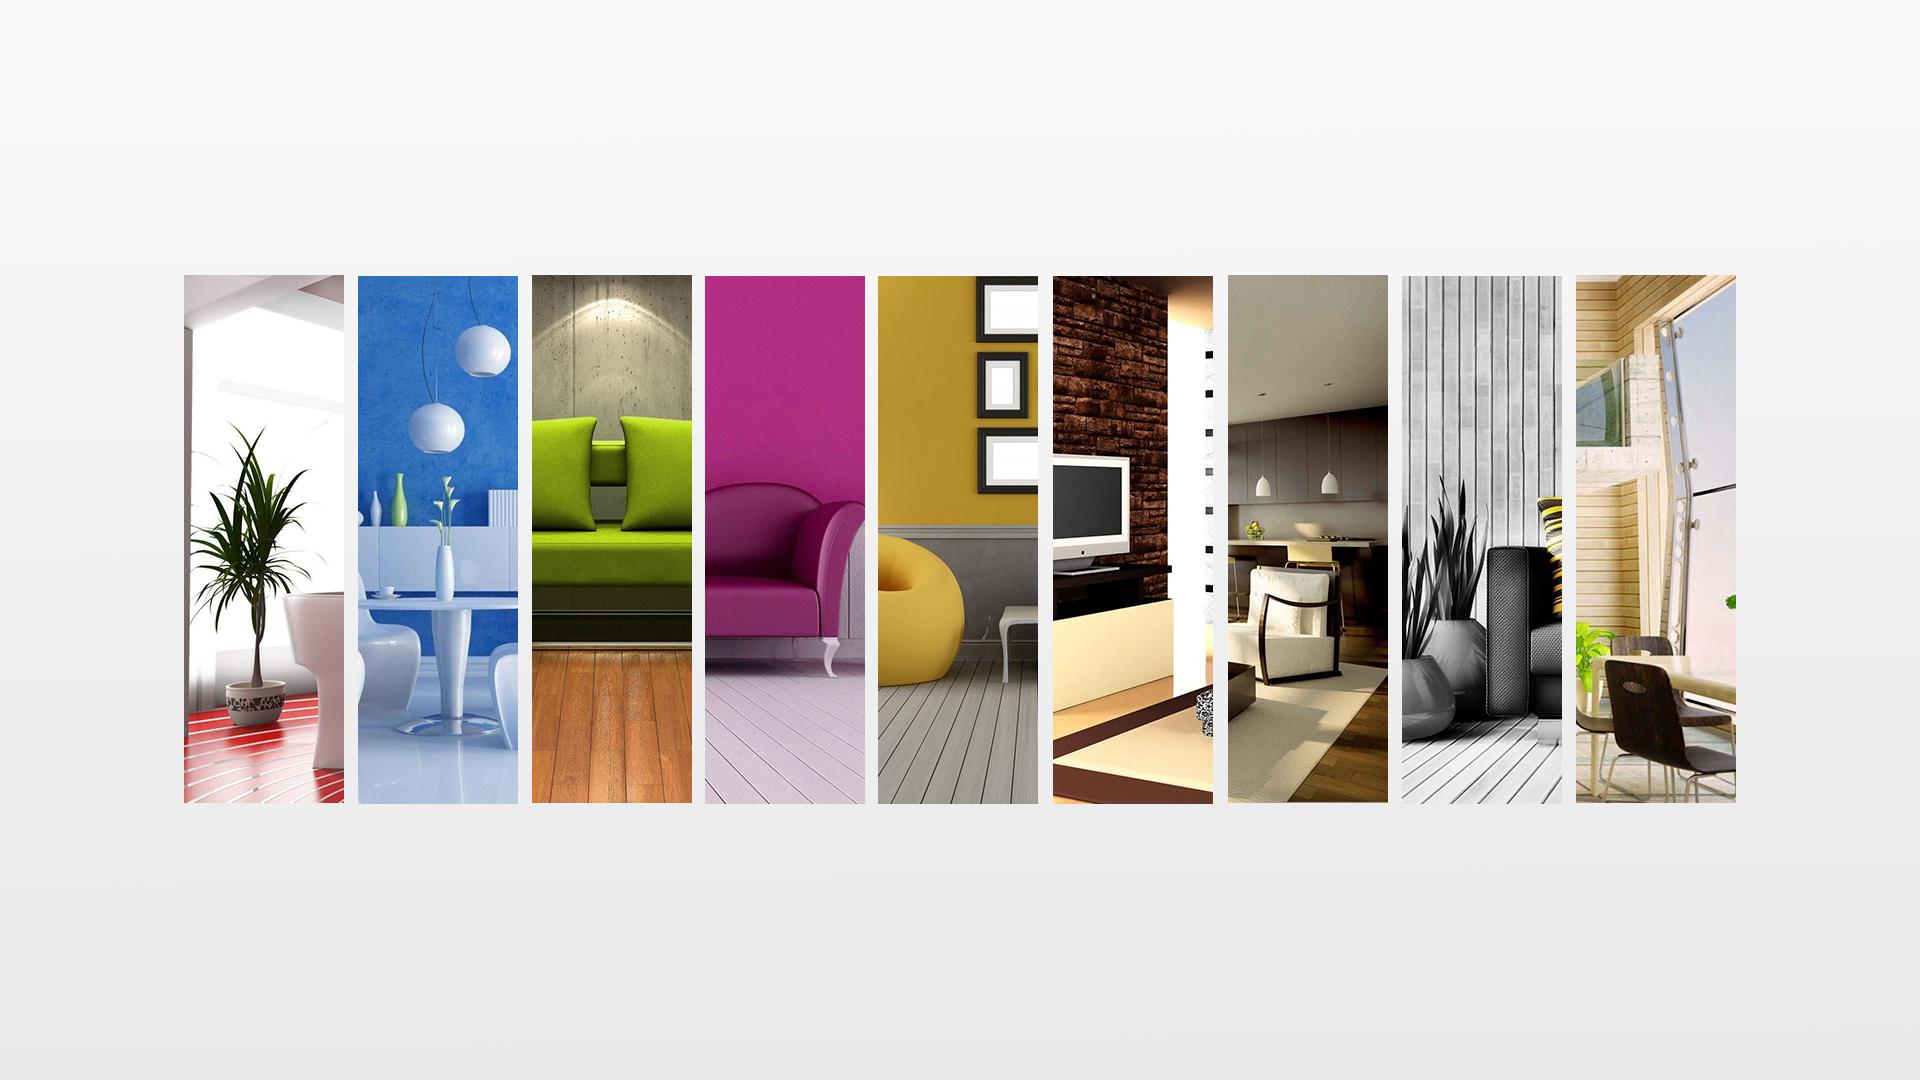 Wallpaper multidesign interior.png